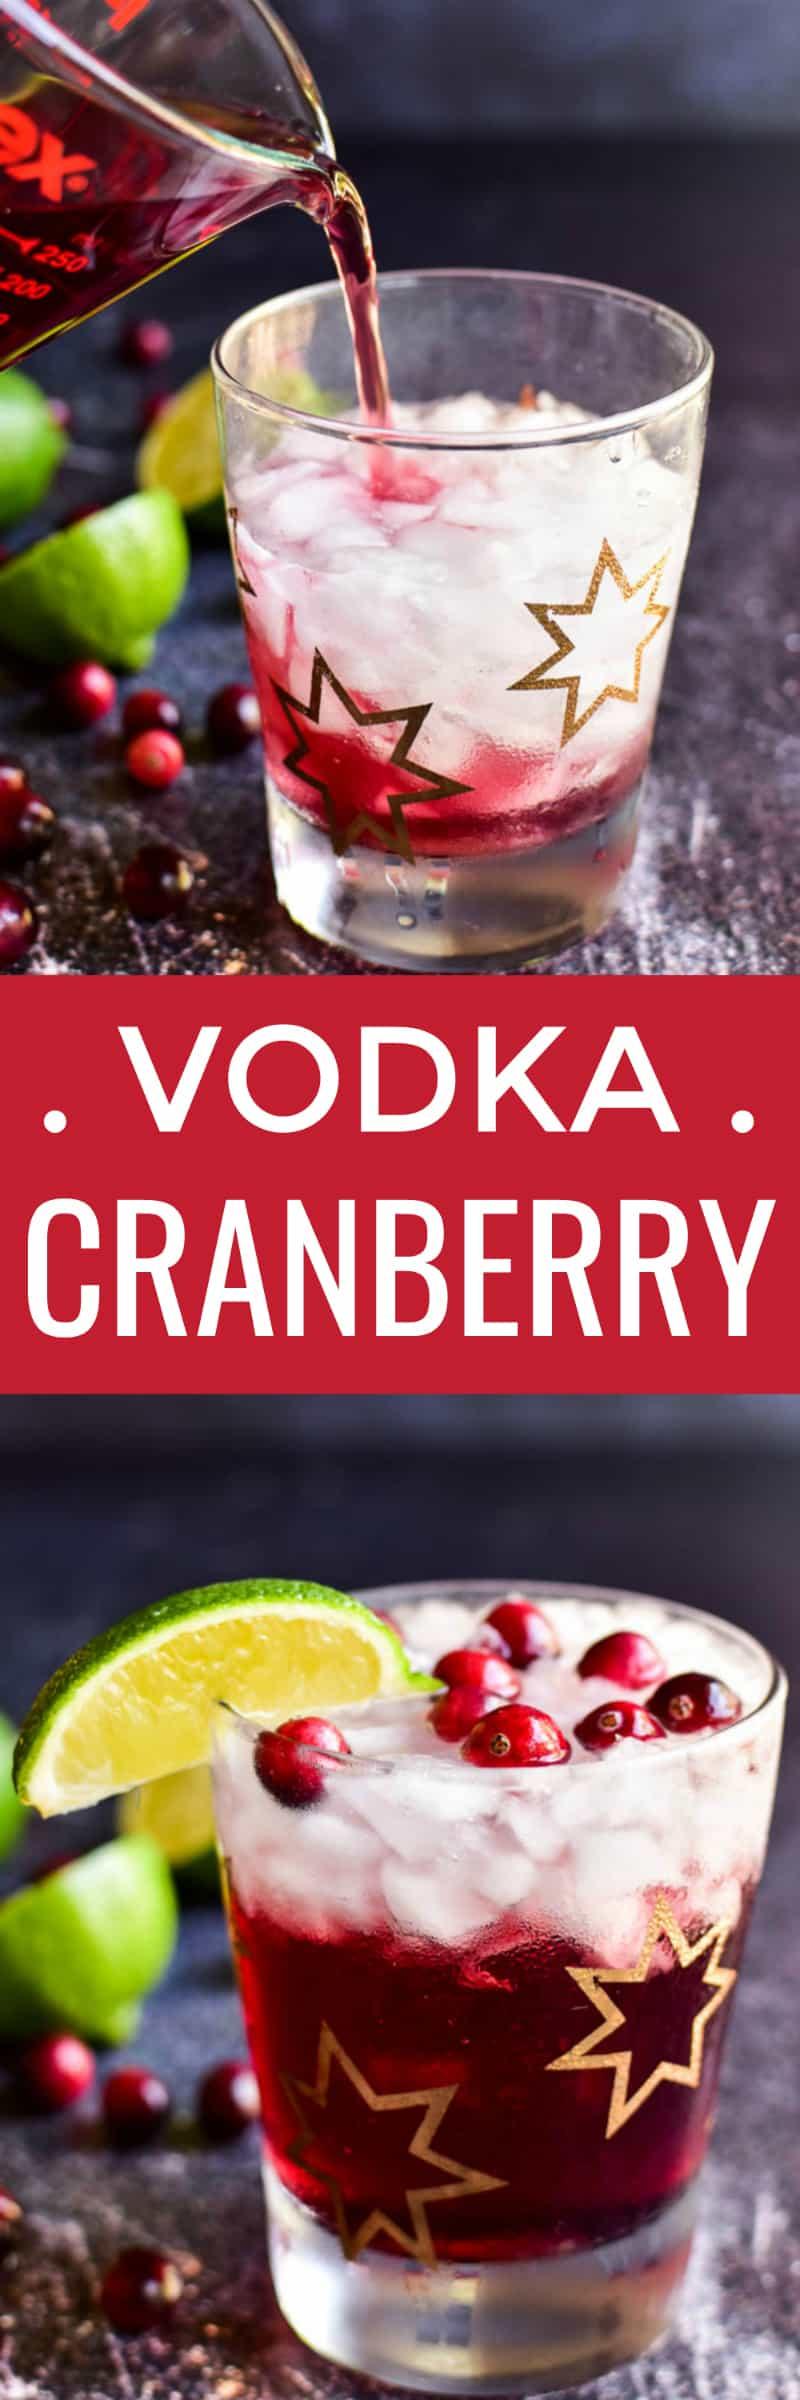 Vodka Cranberry collage image